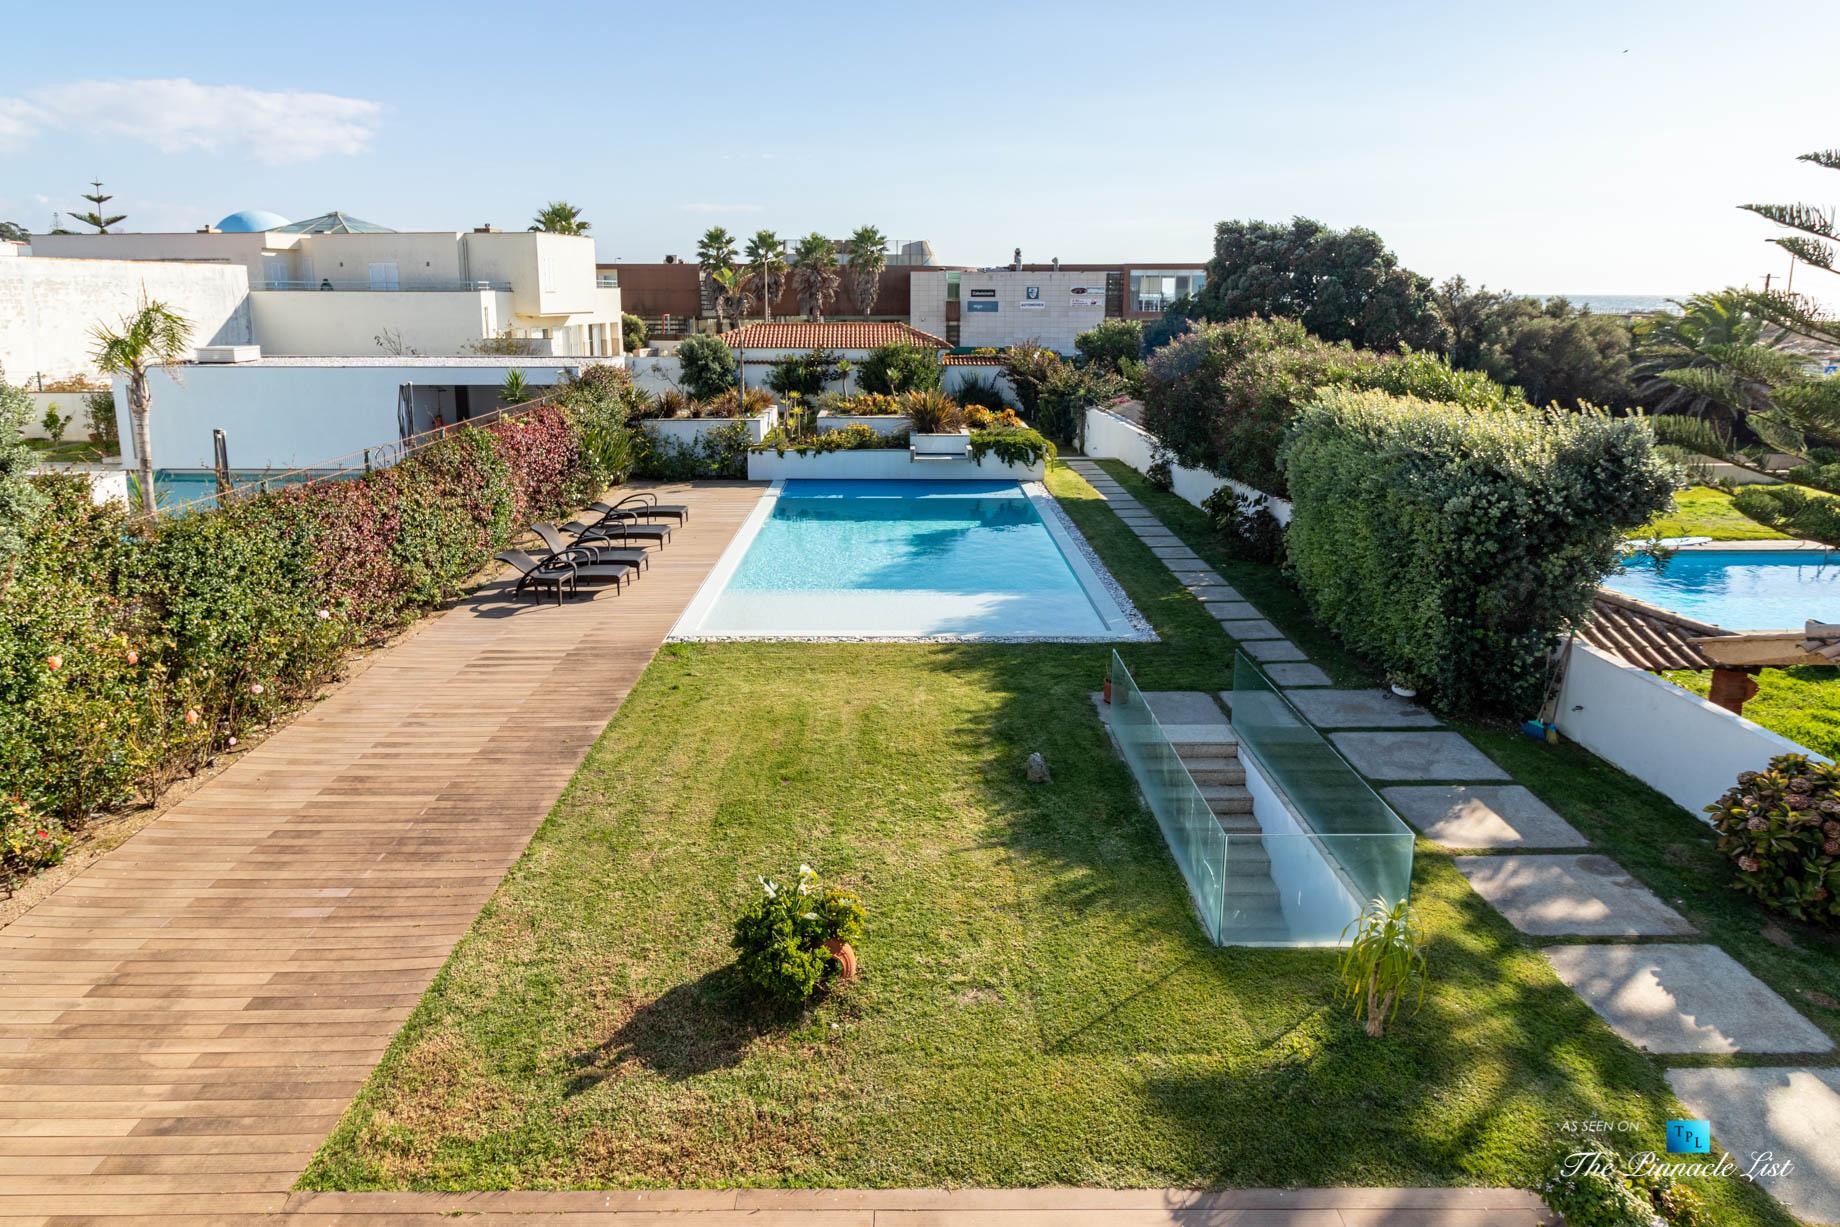 Francelos Beach Luxury T5 Villa - Porto, Portugal - Back Yard with Pool - Luxury Real Estate – Modern Home